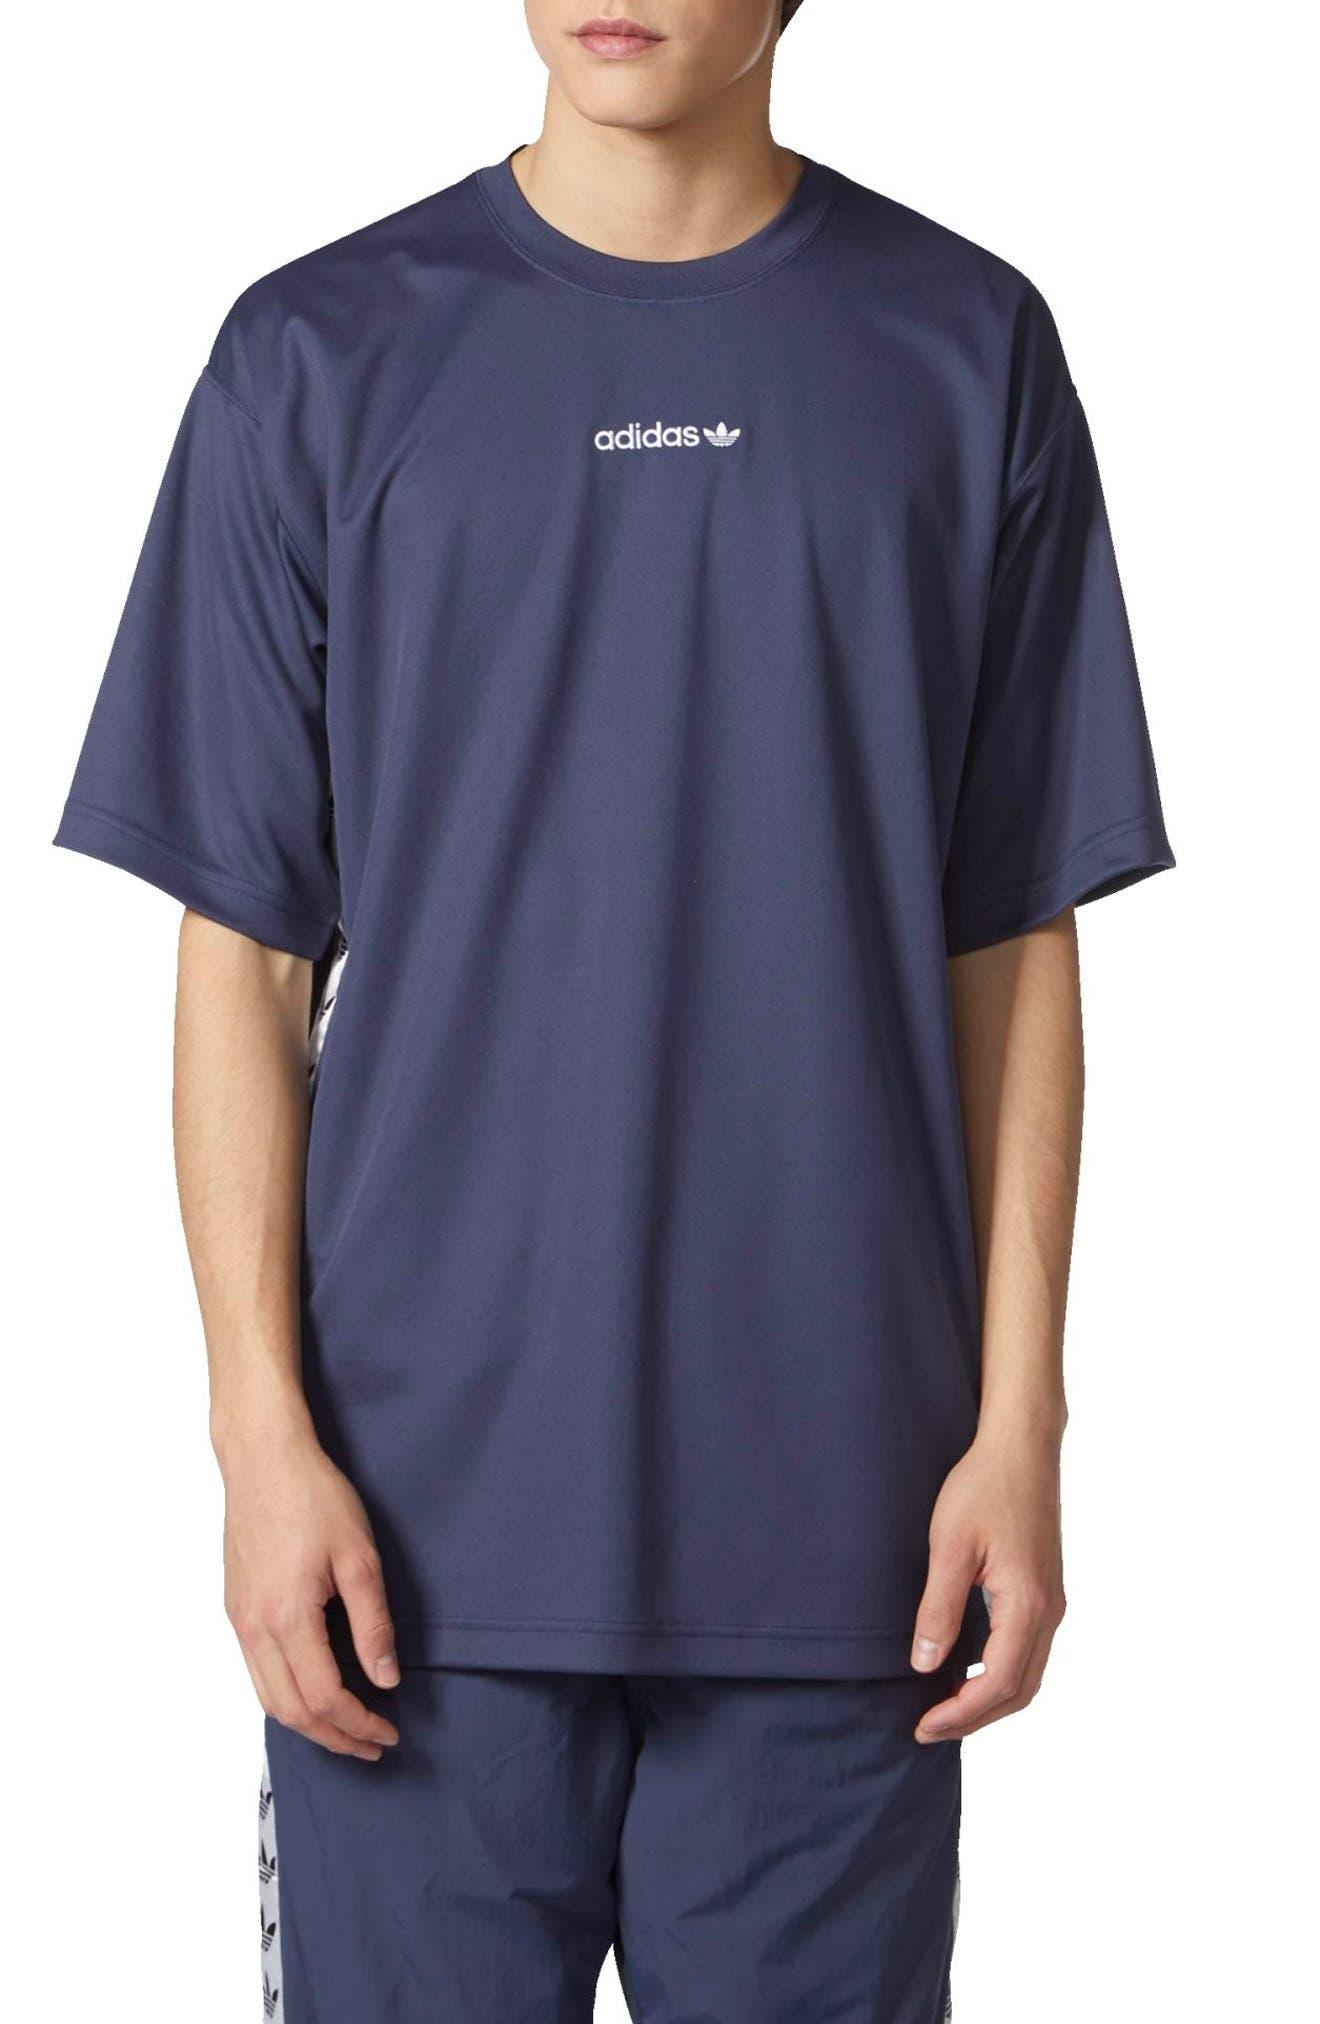 Main Image - adidas Originals TNT Tape T-Shirt